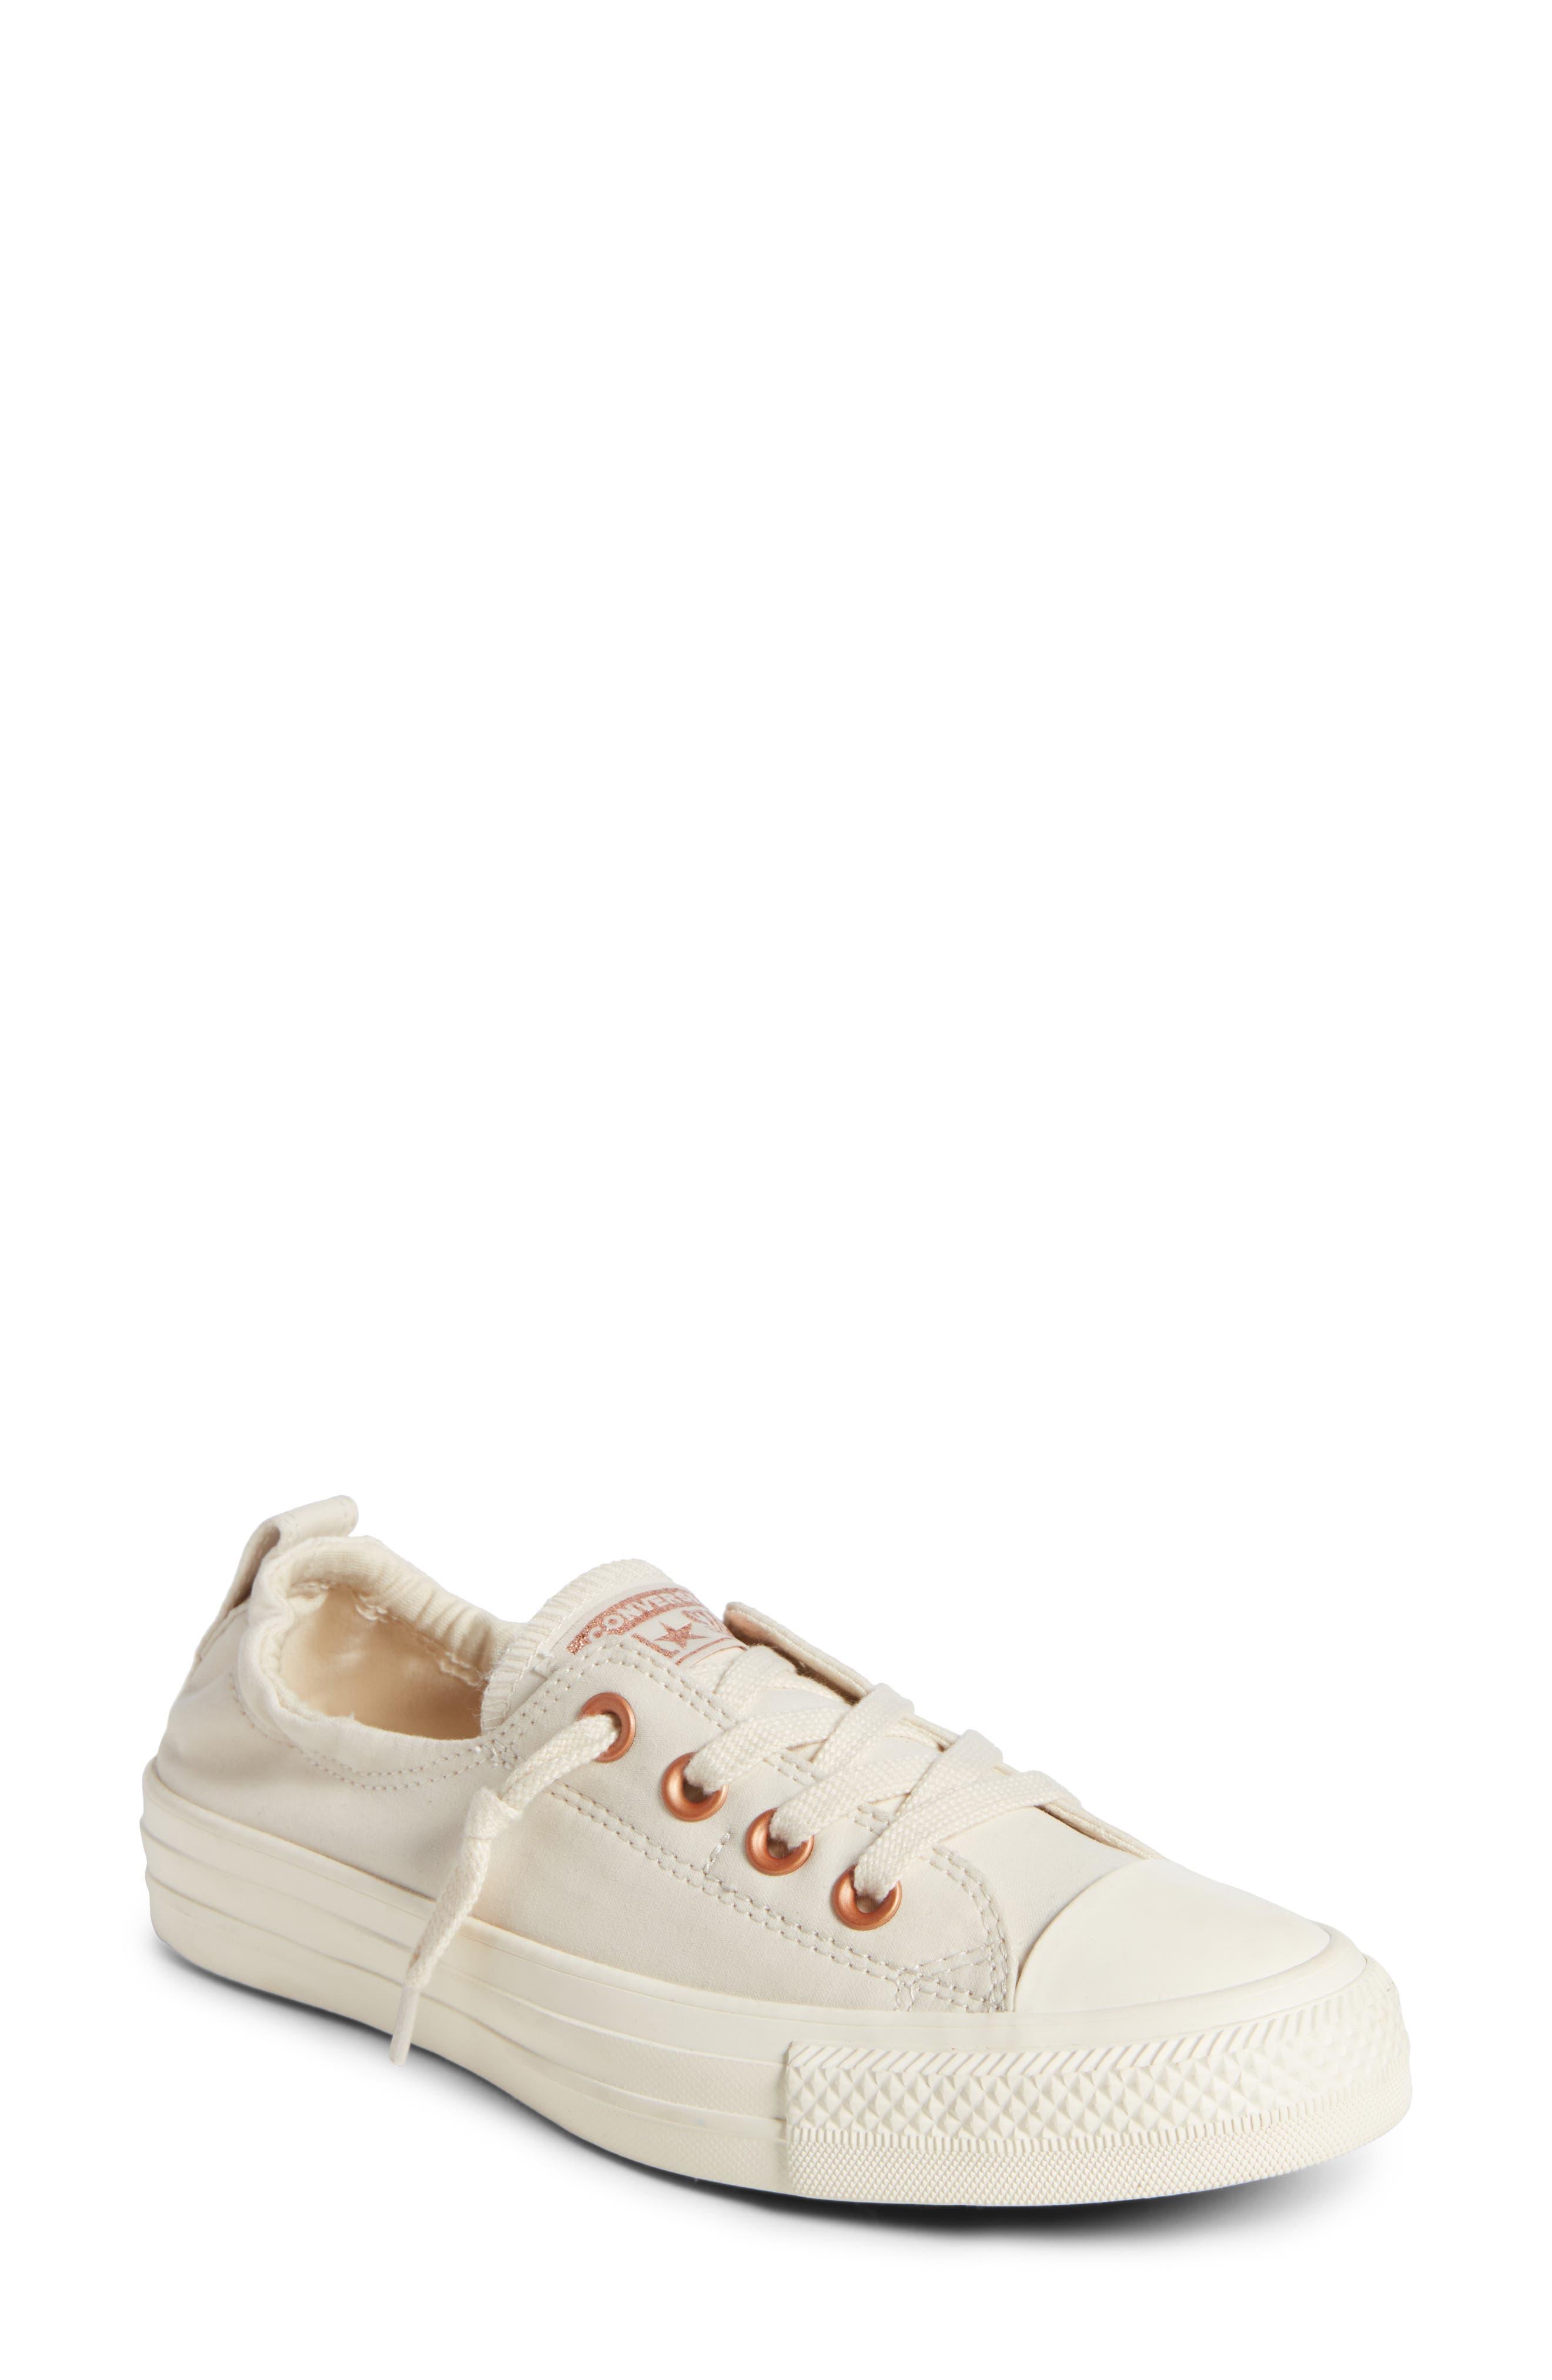 Chuck Taylor<sup>®</sup> 'Shoreline' Sneaker,                         Main,                         color, Light Twine